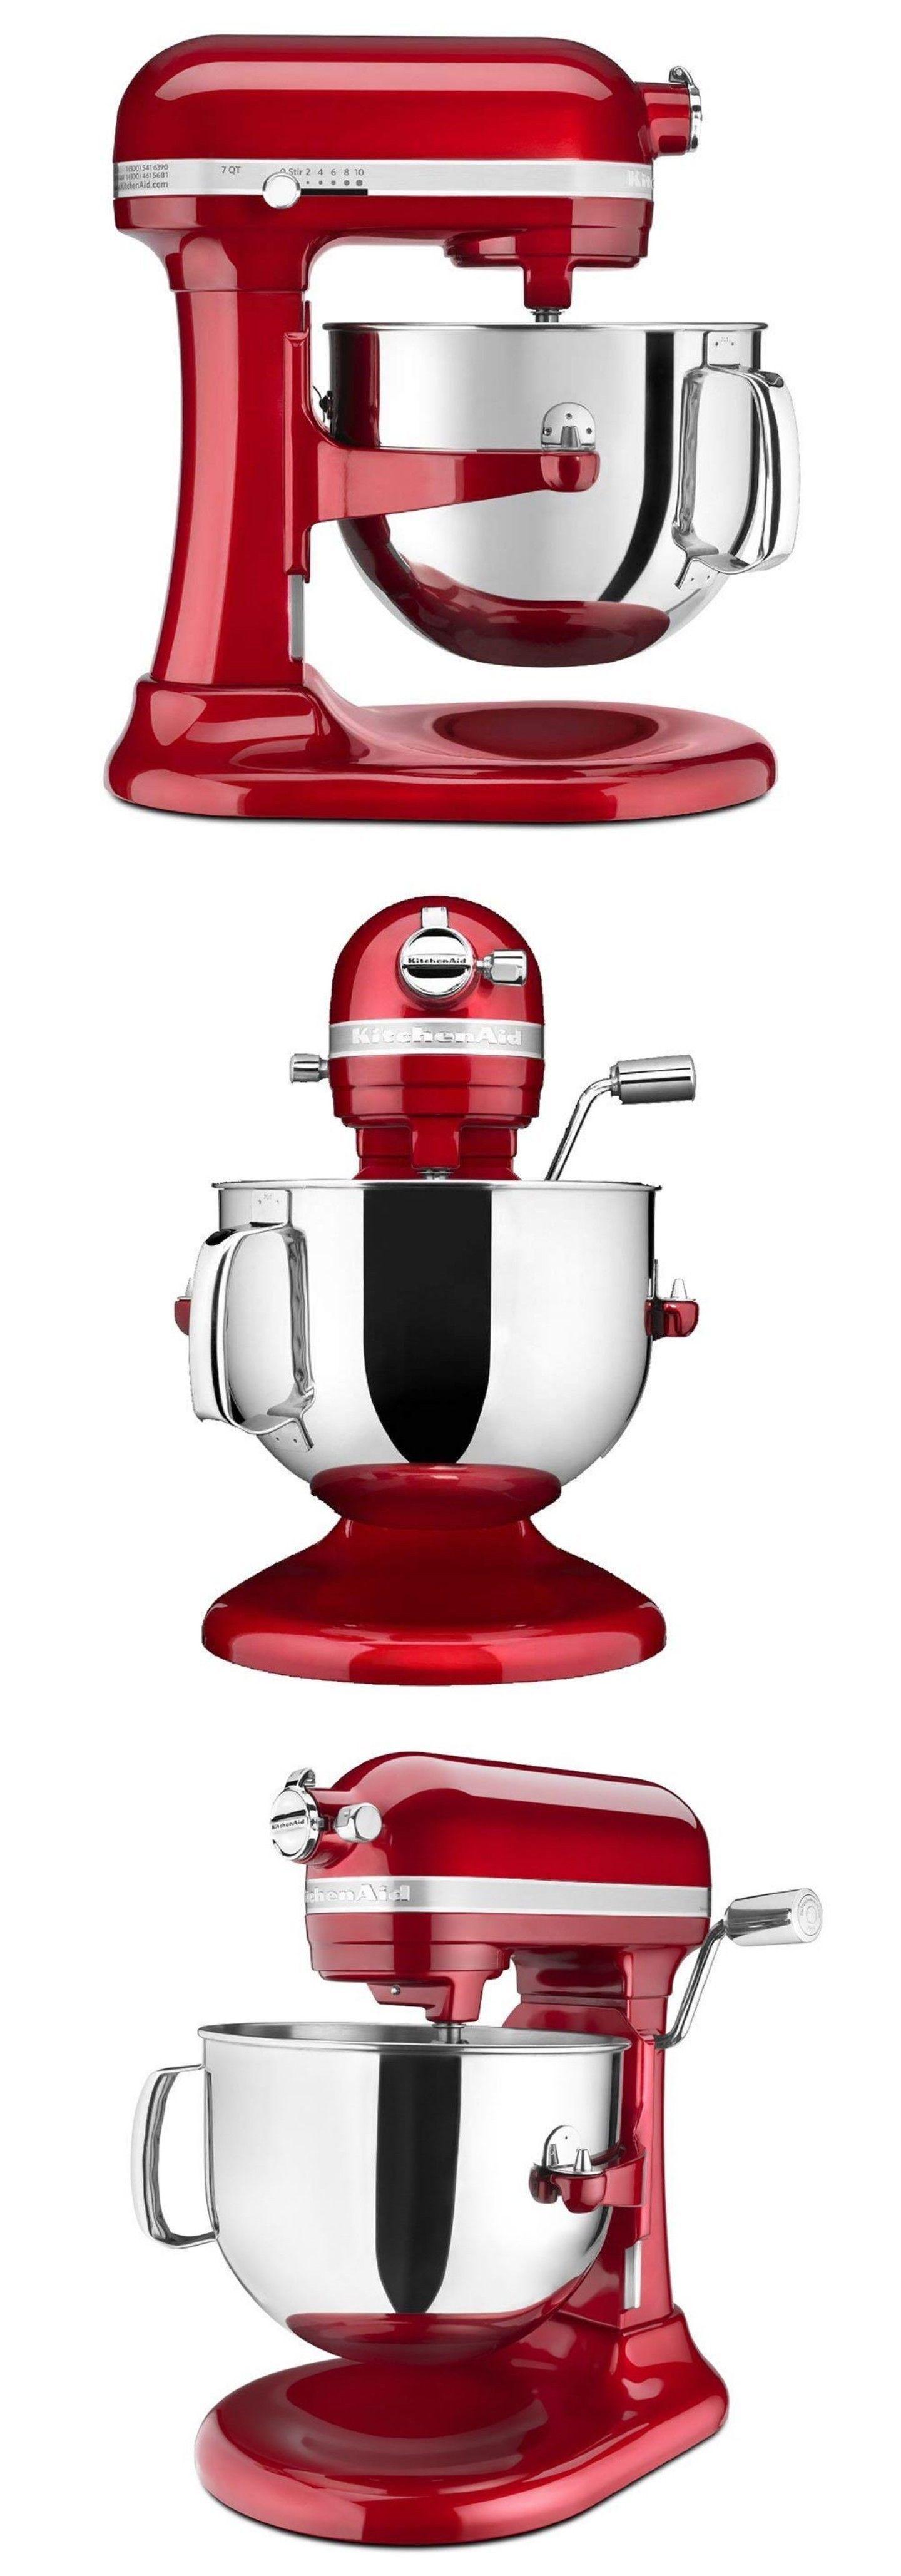 kitchenaid pro line mixer ksm7586pfp